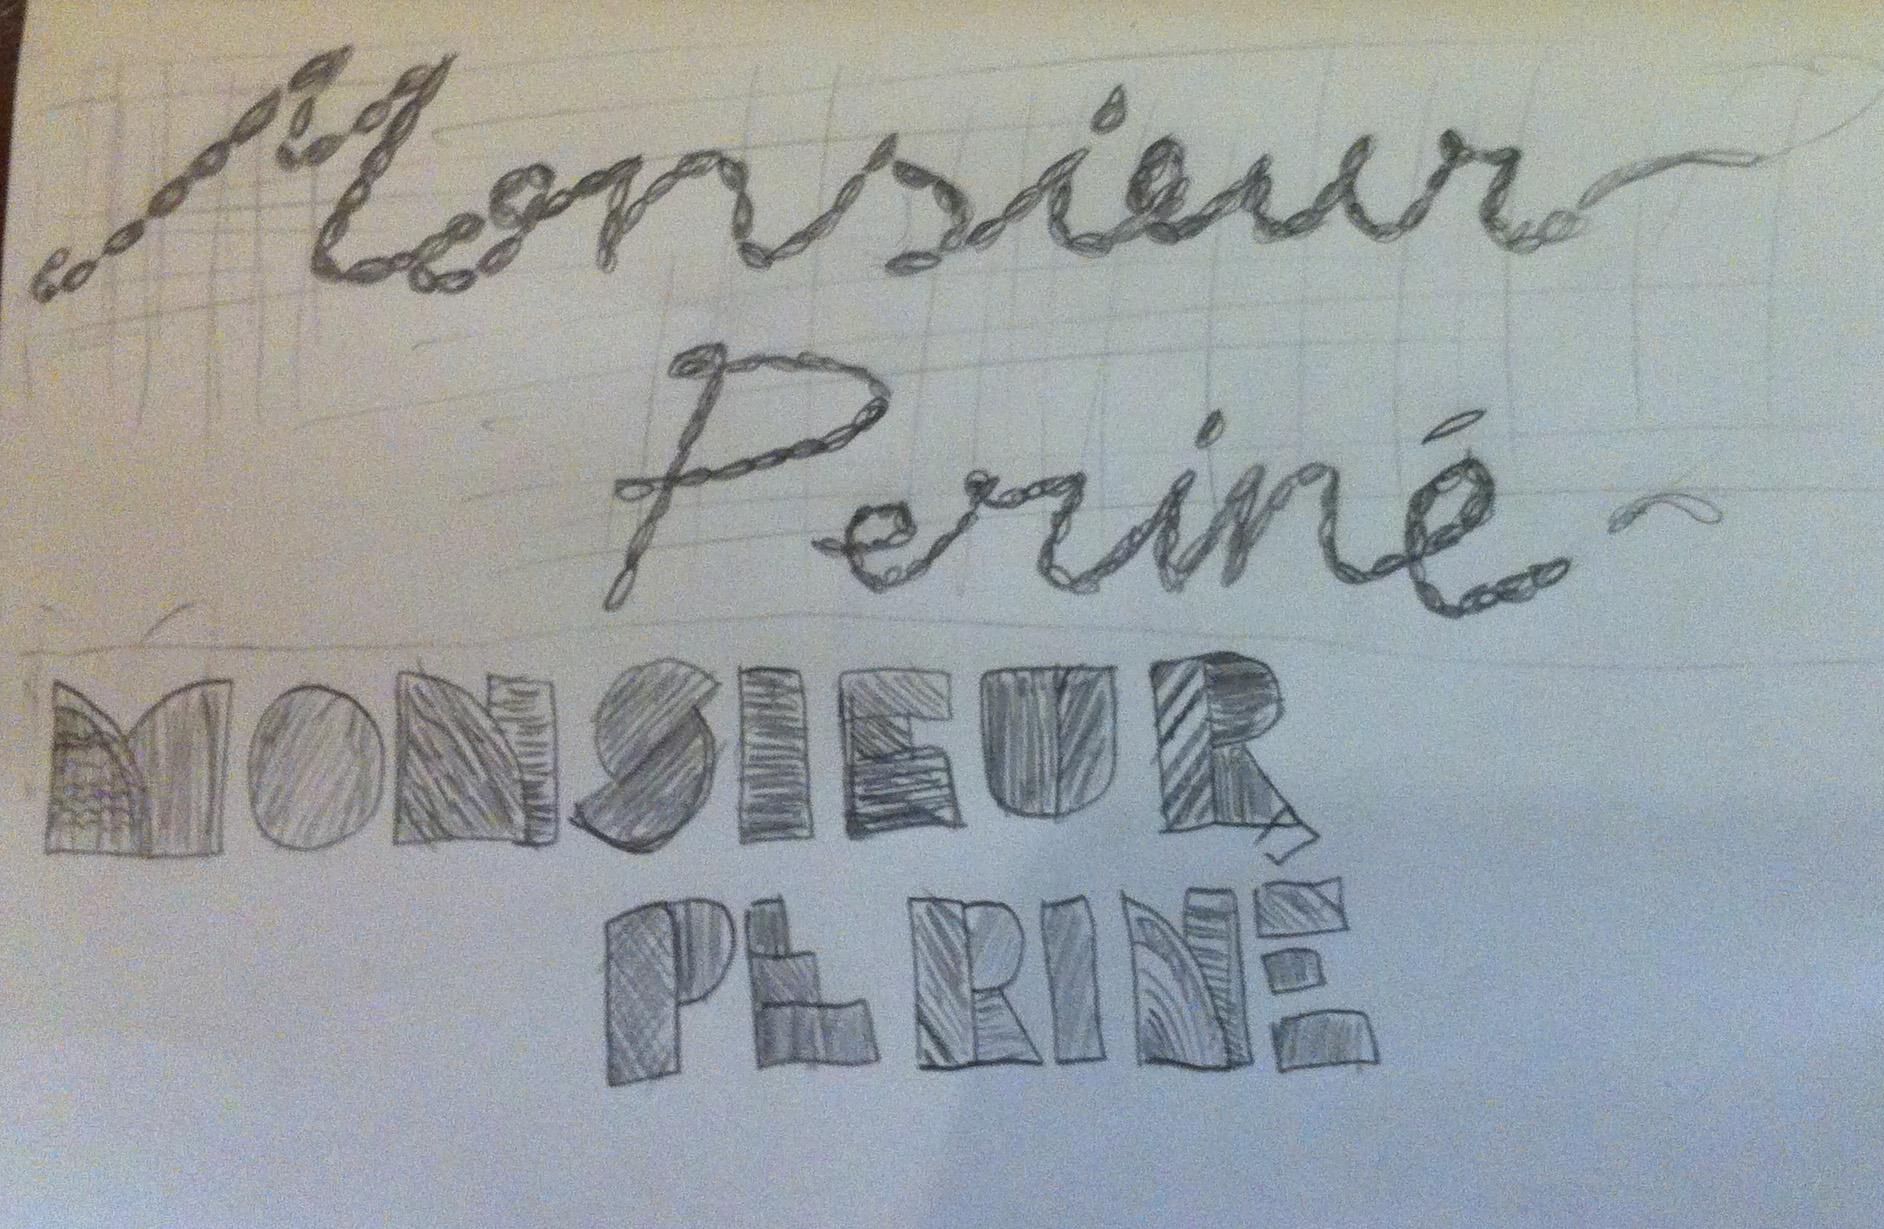 Monsier Periné's Andean Tour - image 9 - student project